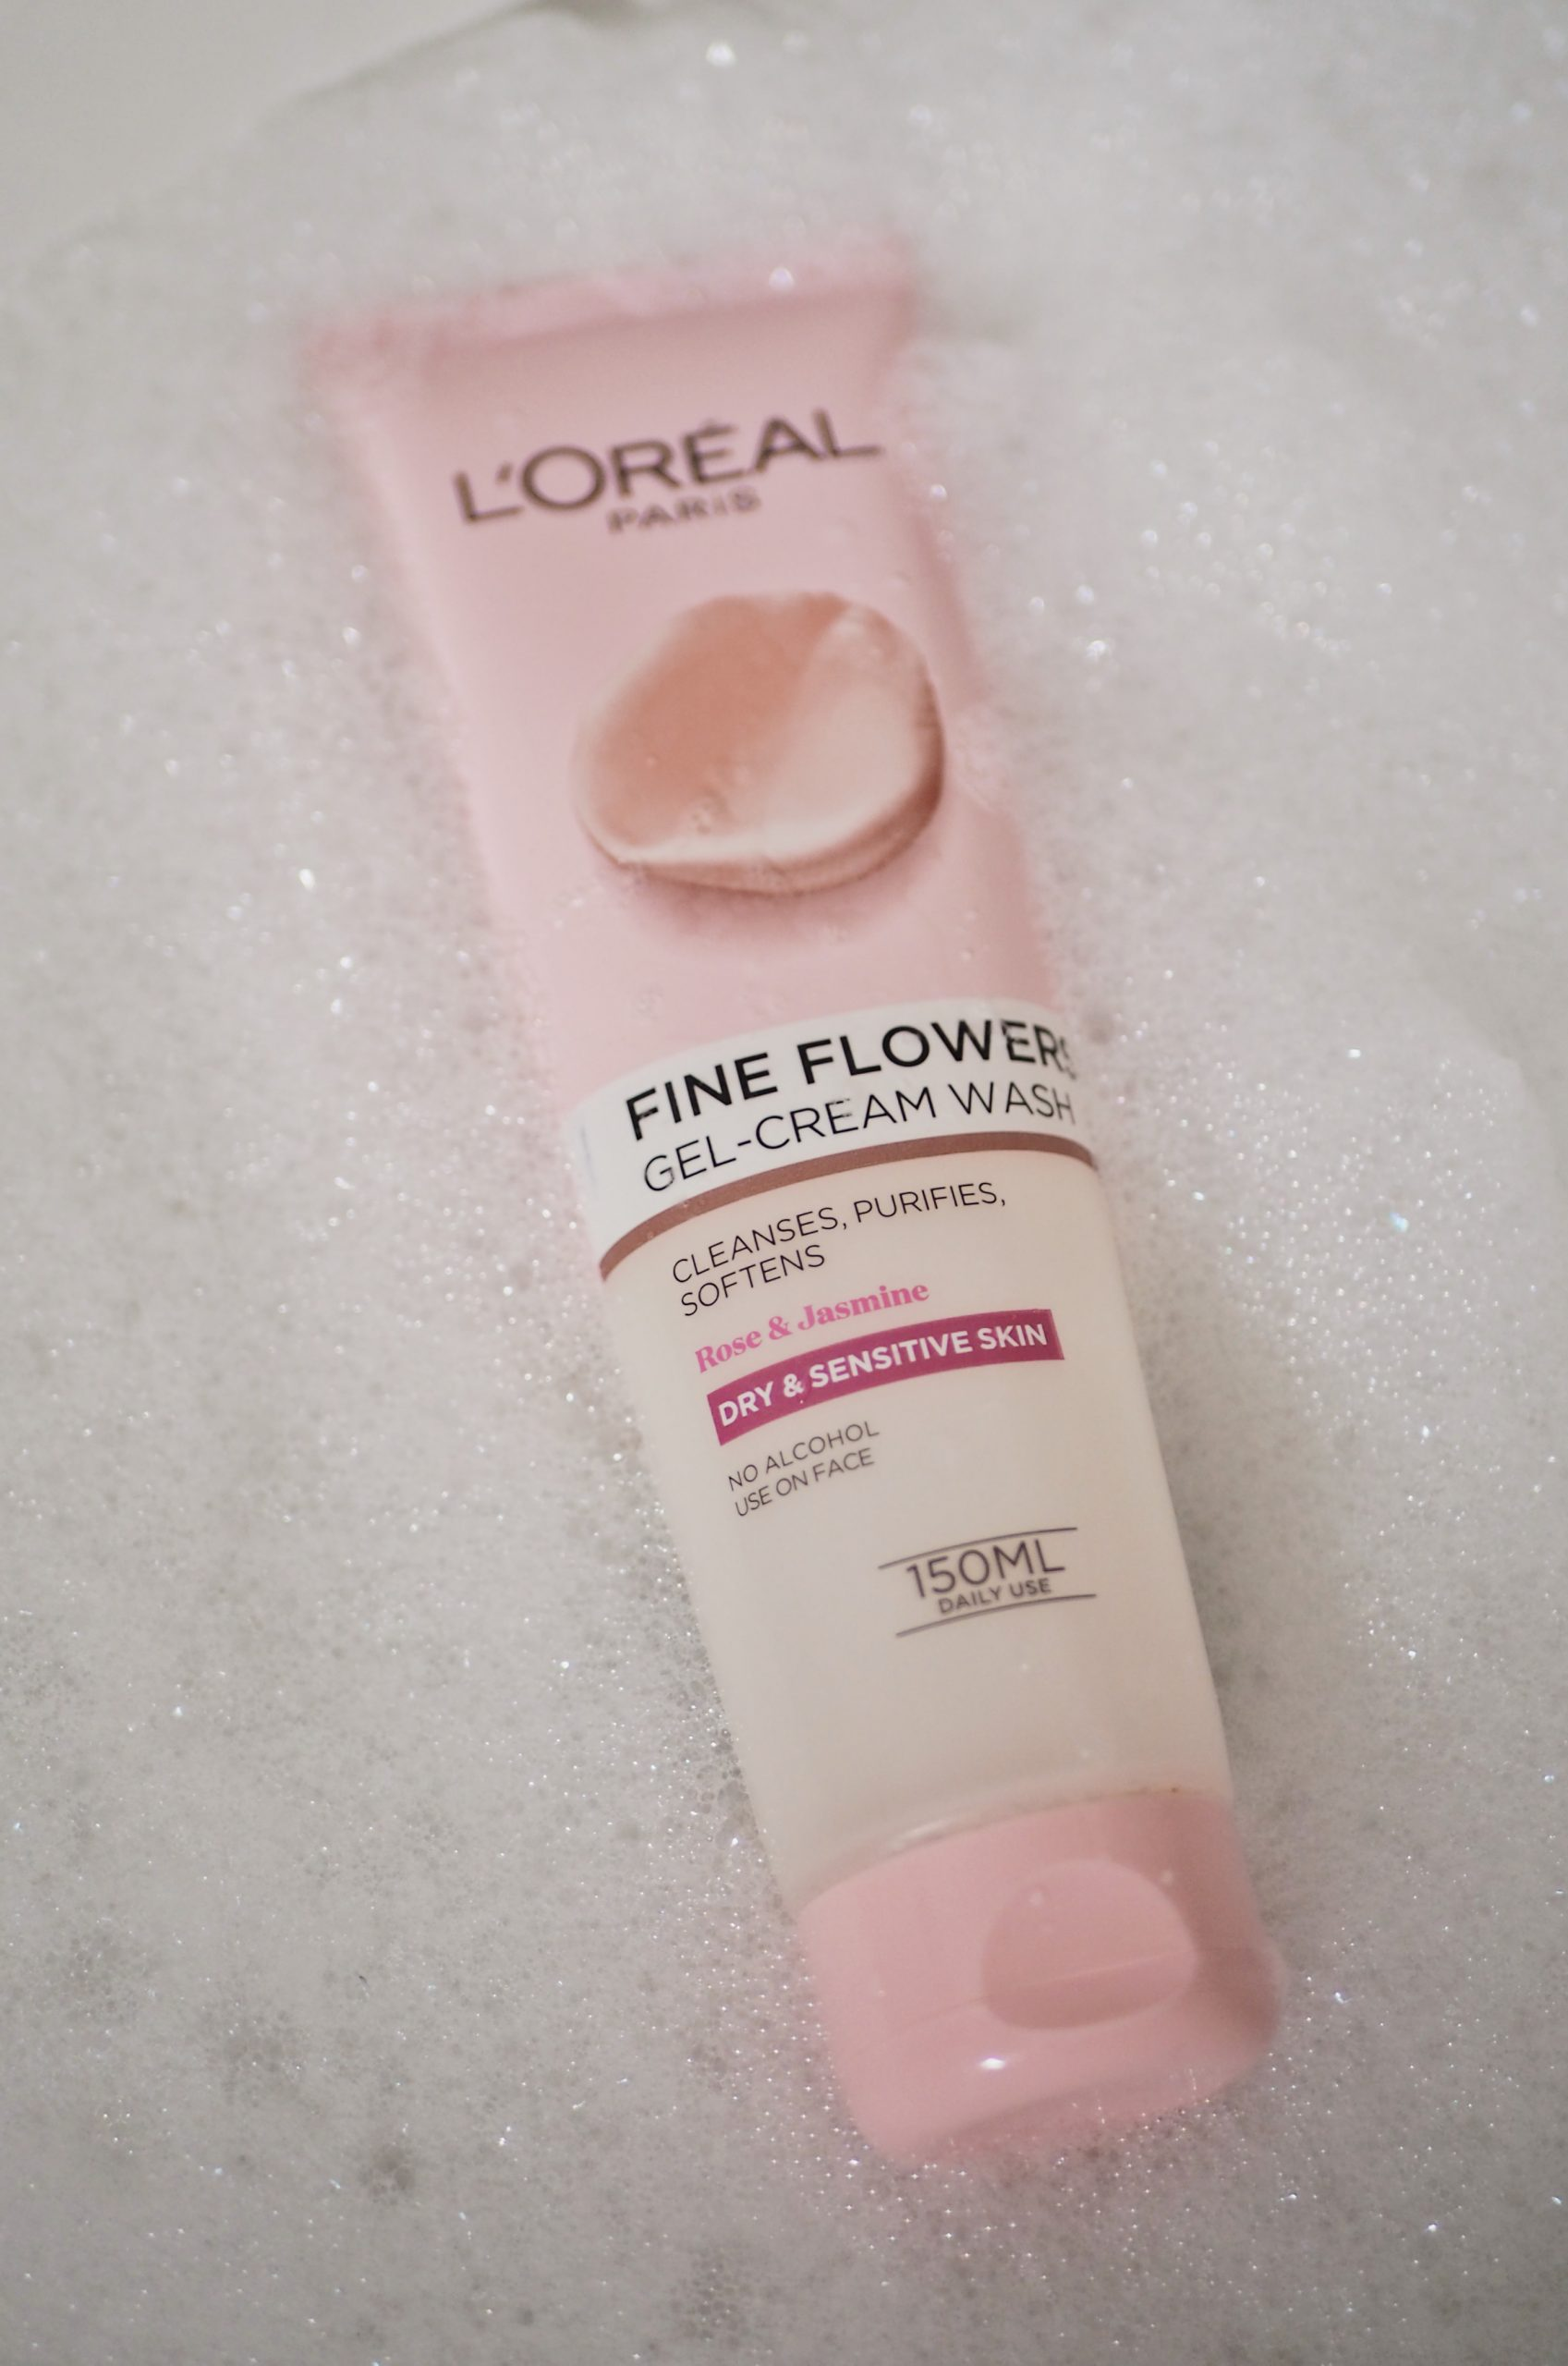 Loreal Cleanser, Gel-Cream Wash, Fresh Flowers, cleanser for sensitive skin, cleanser for dry skin, skincare, Katie Writes,